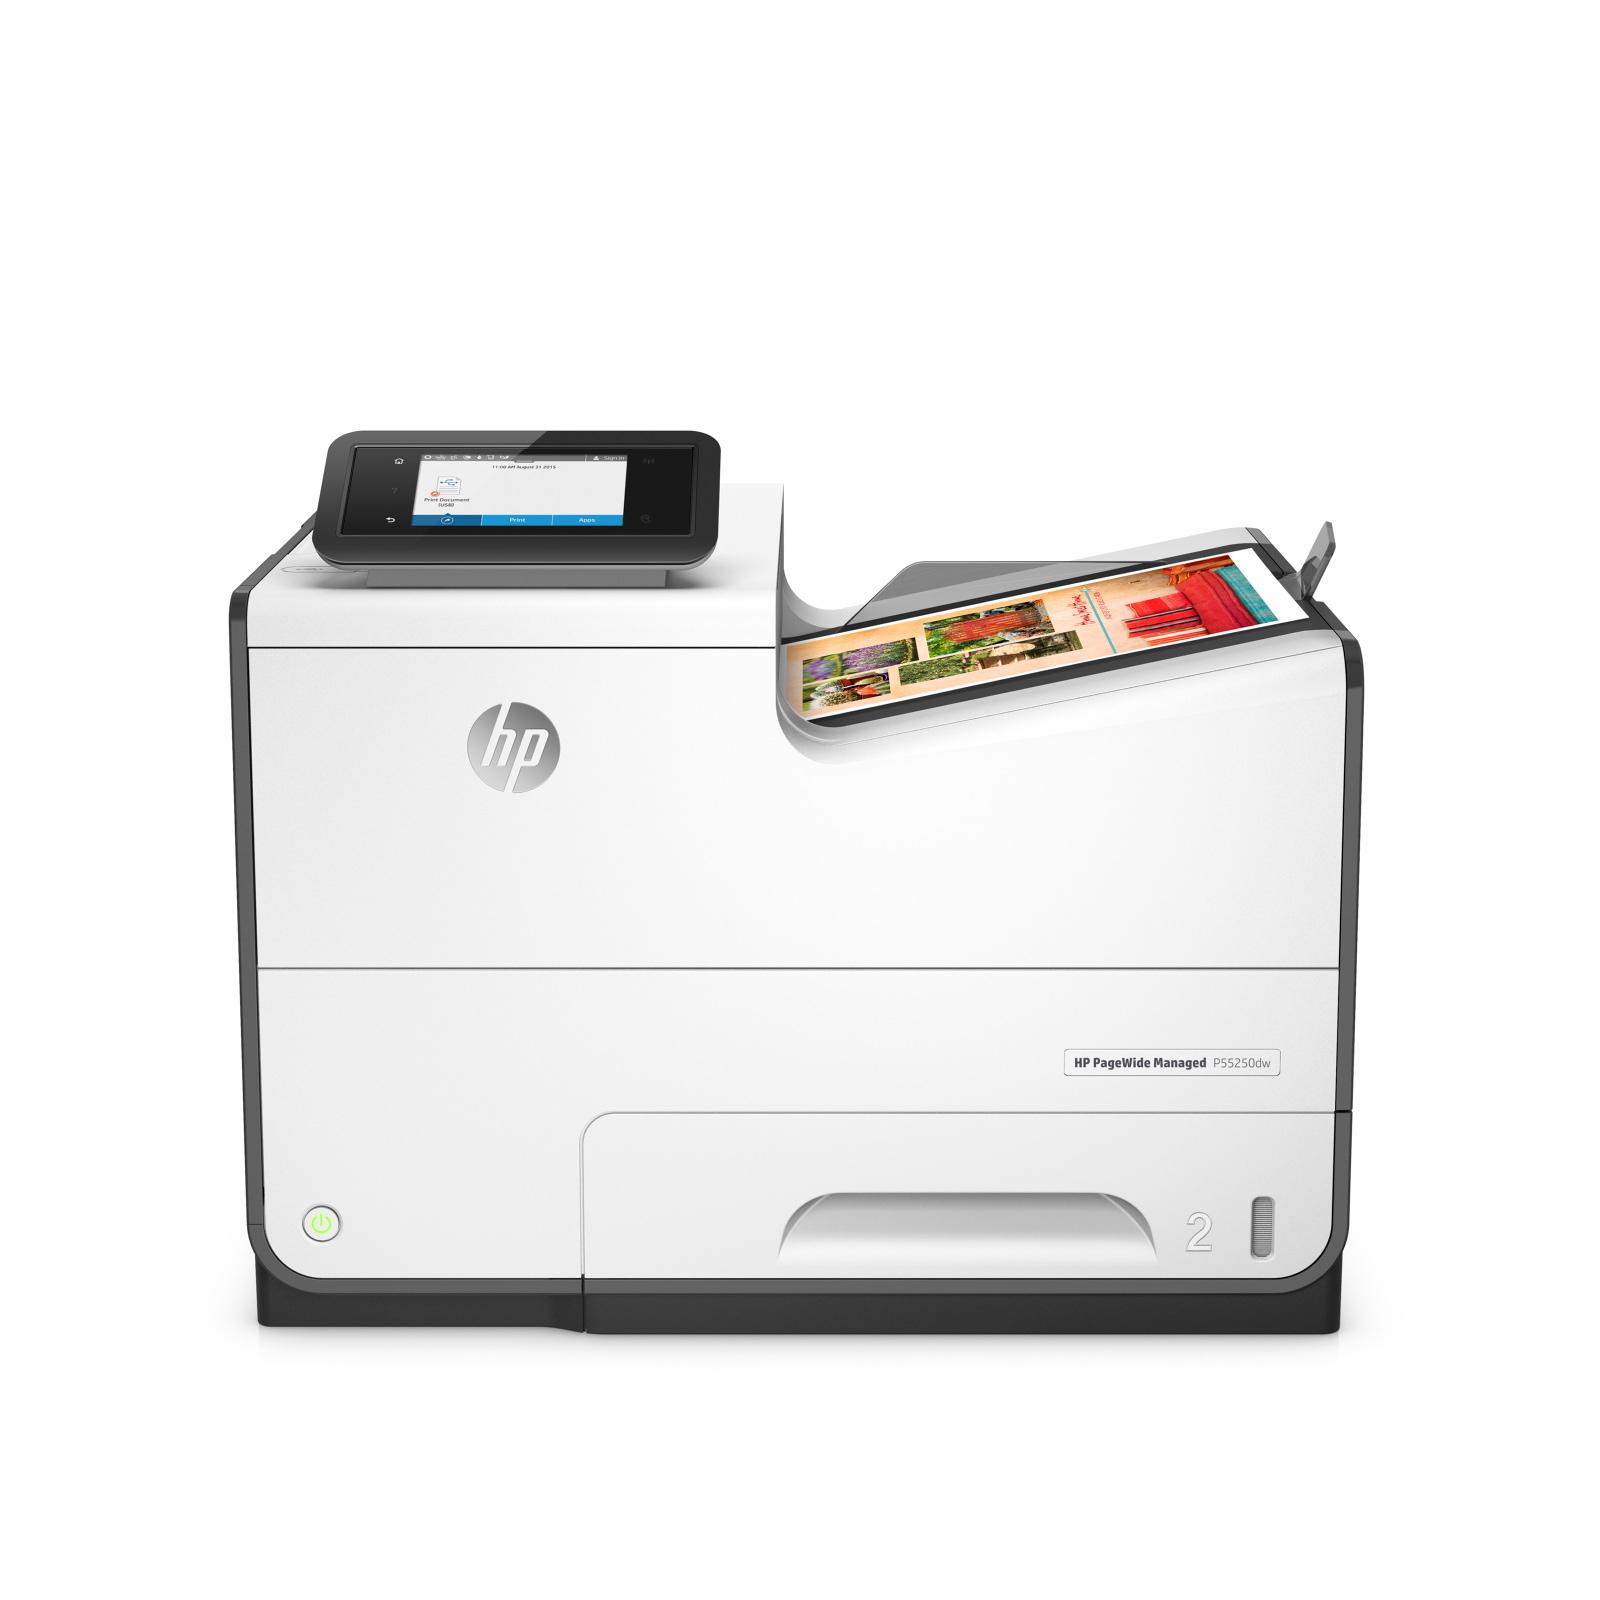 HP PageWide Managed P55250dw inkjet printer Colour 2400 x 1200 DPI A4 Wi-Fi